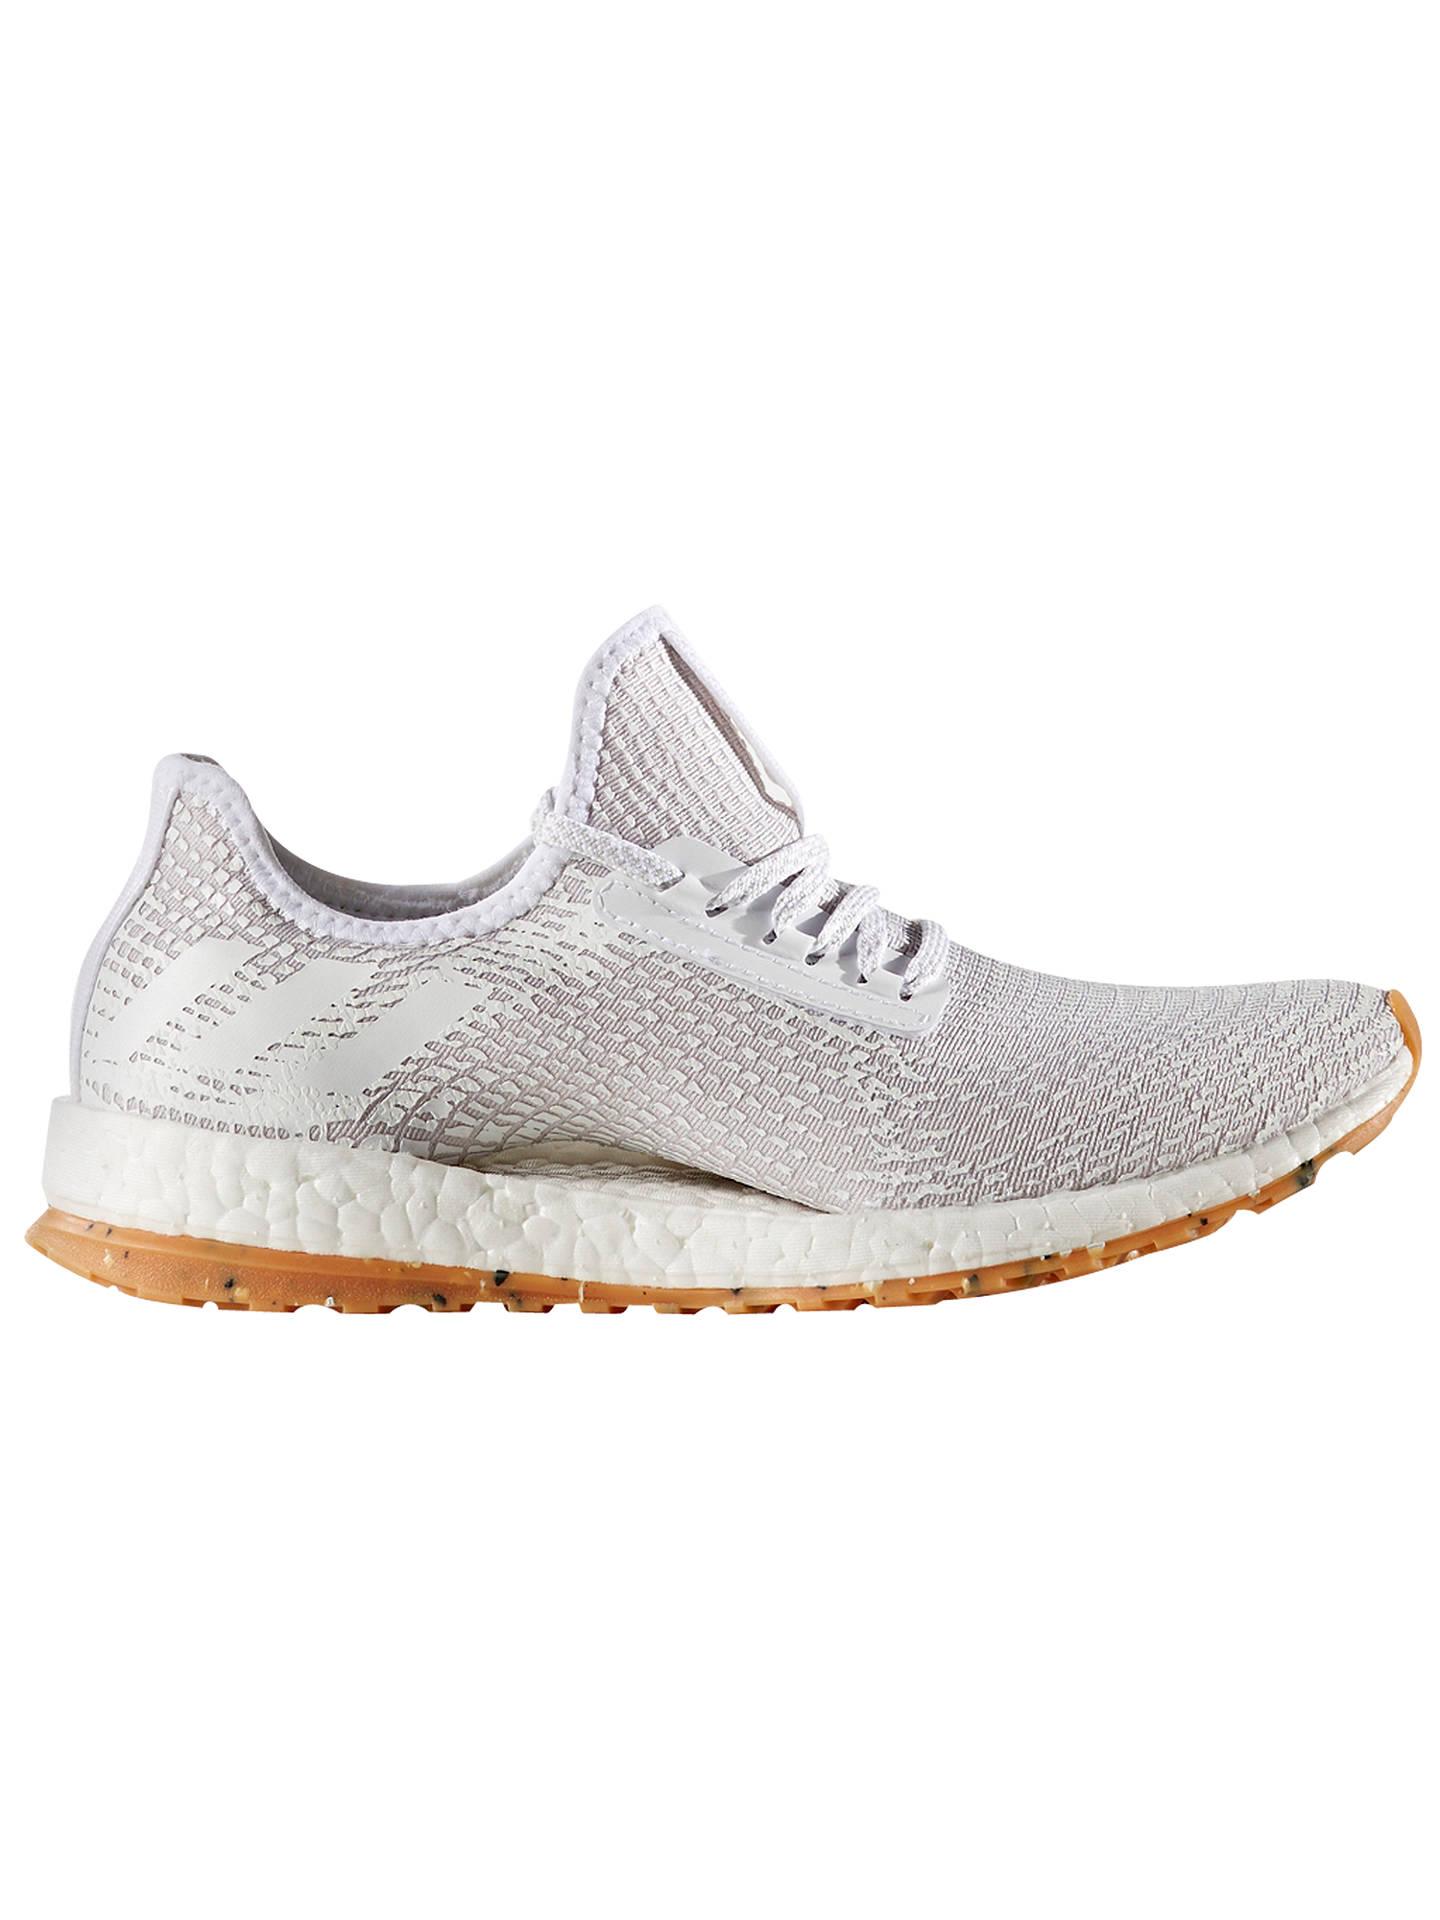 eda71f5d6edd0 Buy Adidas Pureboost All-Terrain Women s Running Shoes